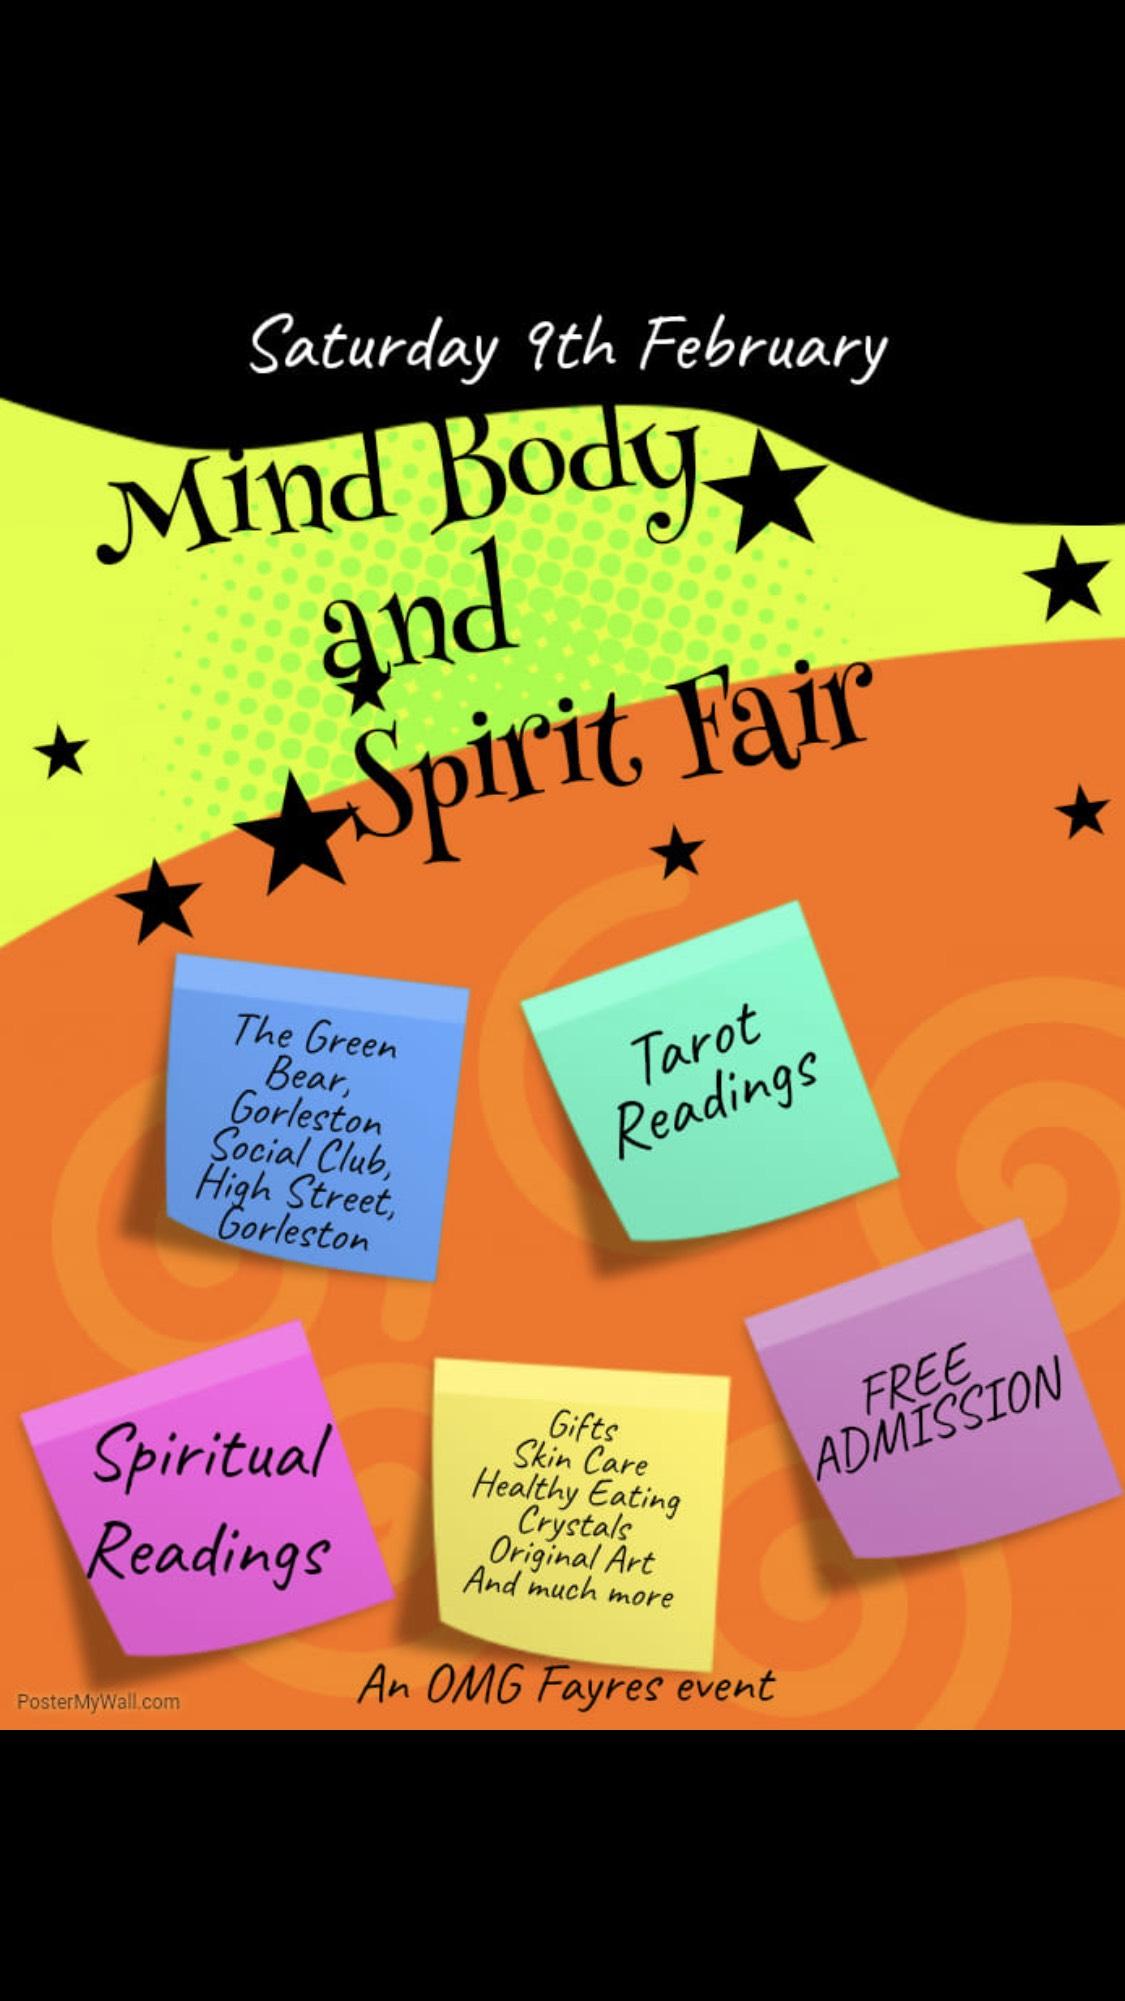 Mind, Body, and Spirit Fair